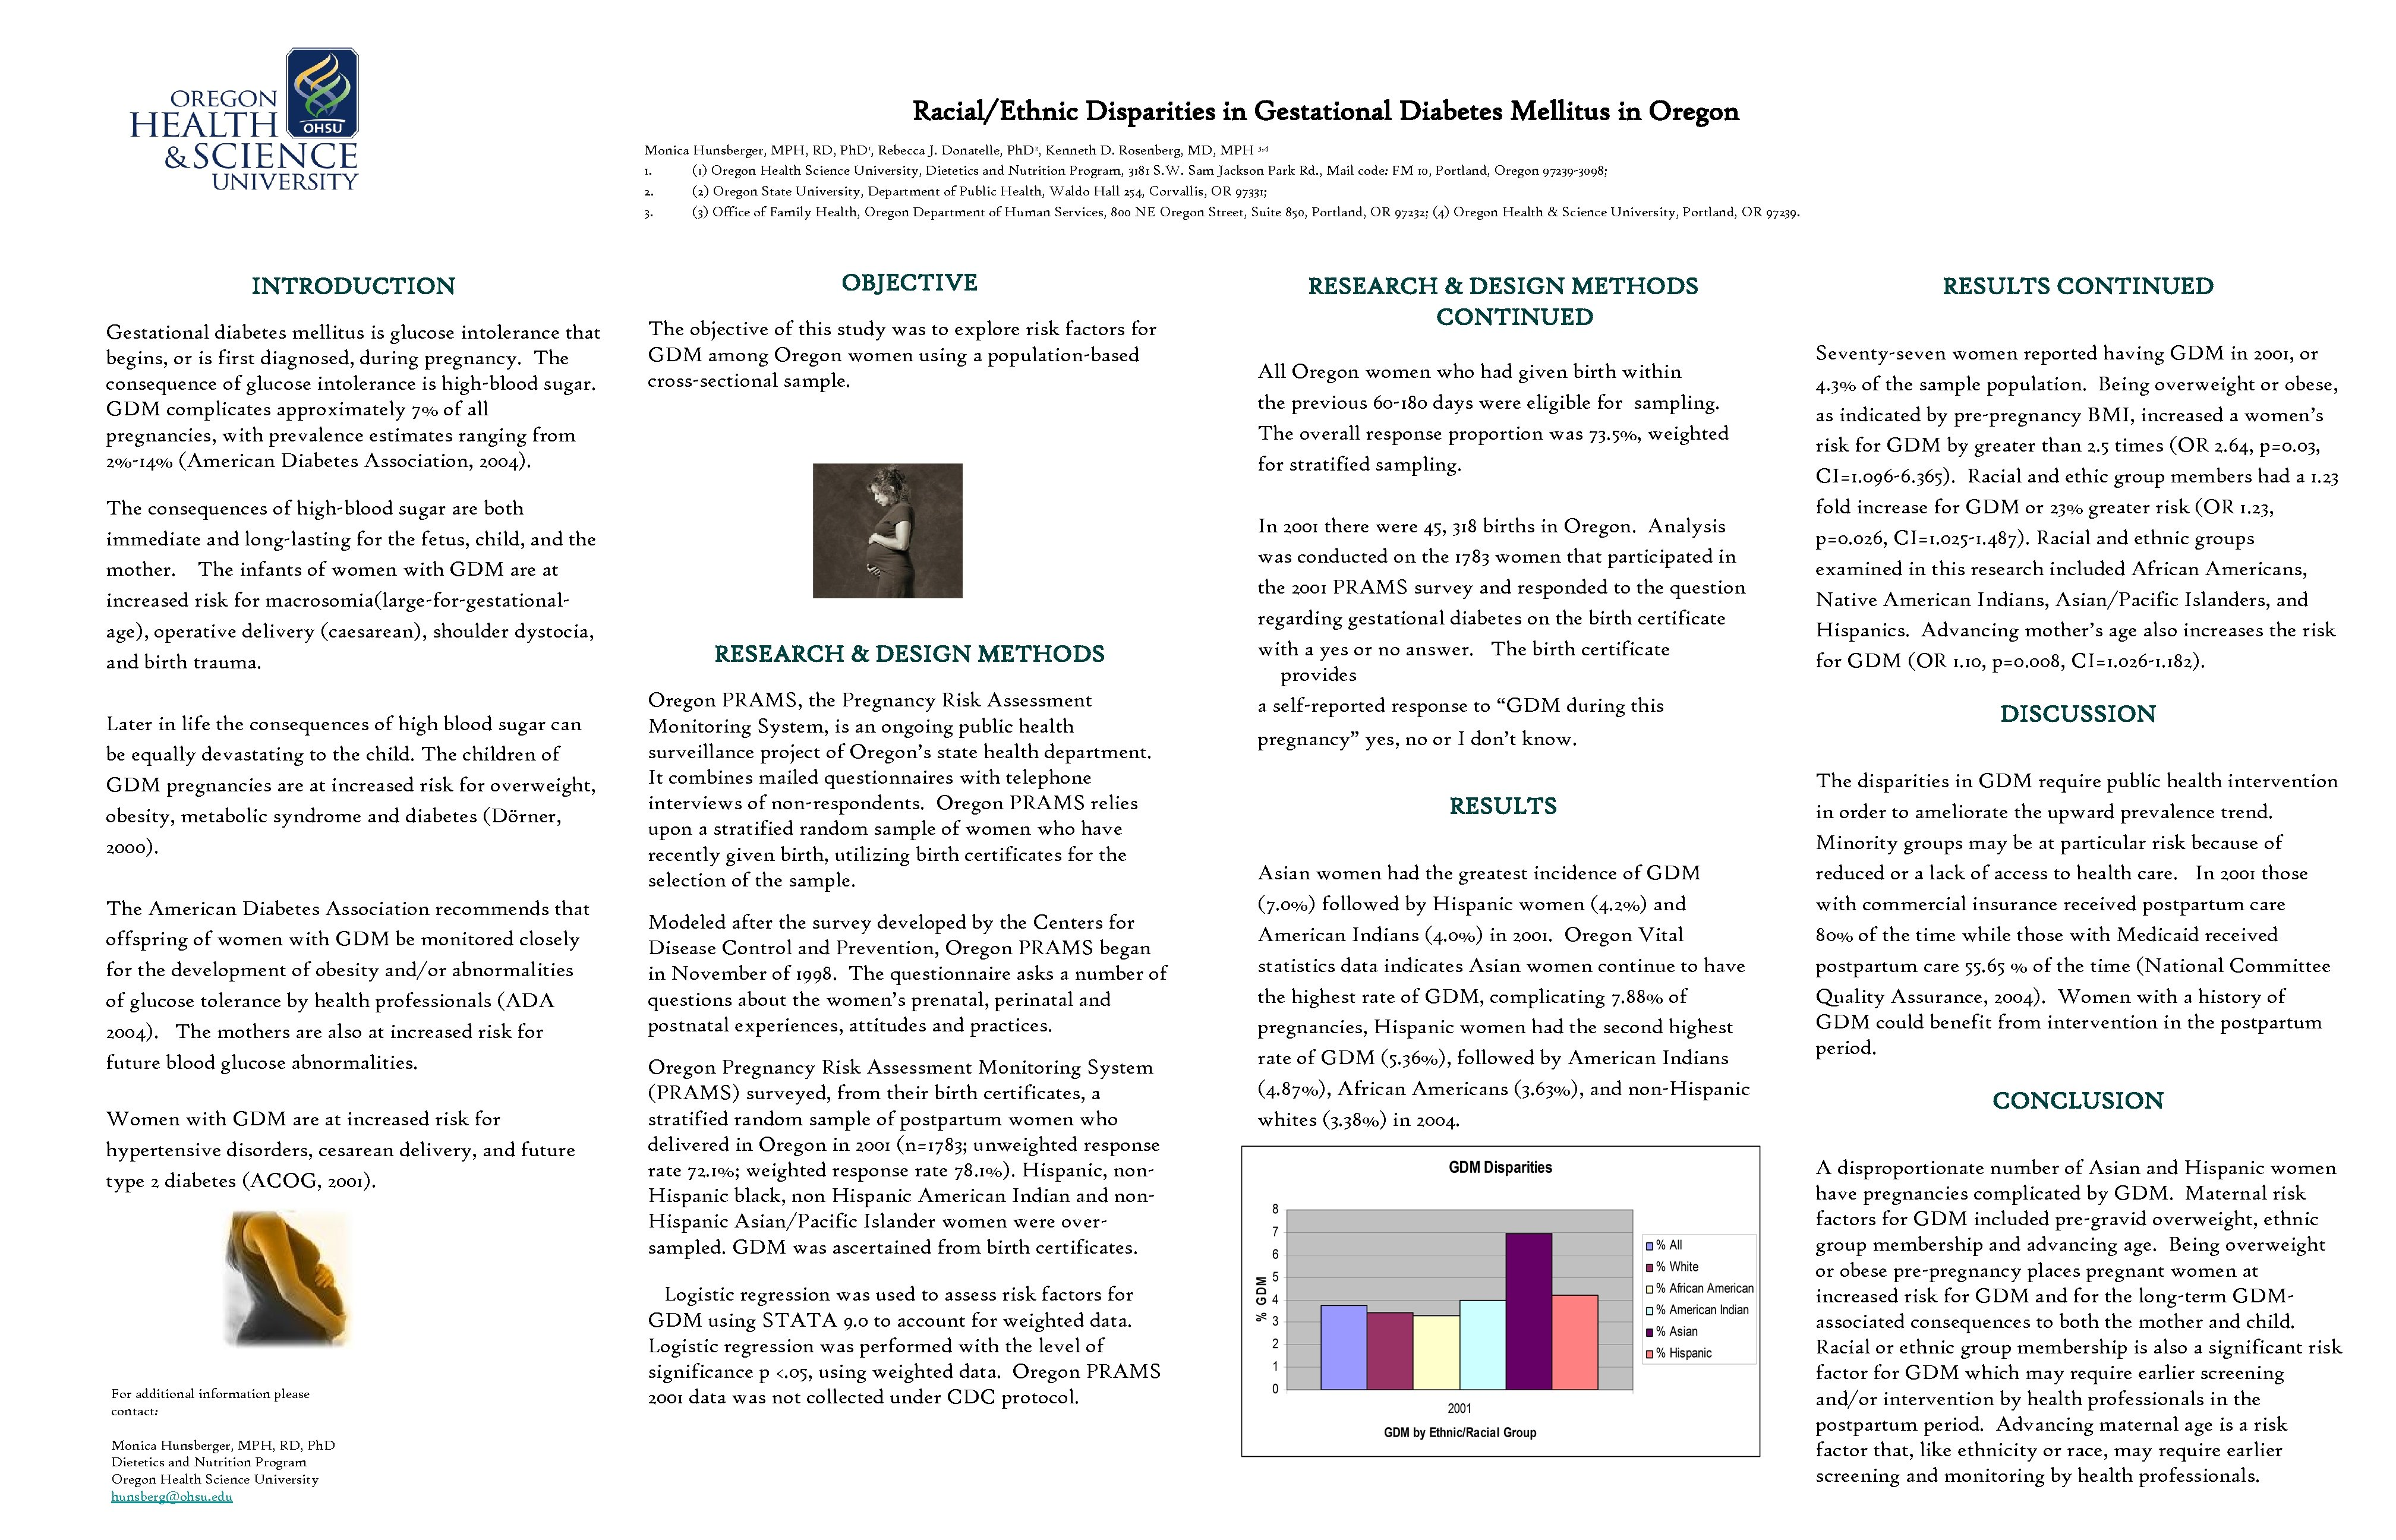 Racial/Ethnic Disparities in Gestational Diabetes Mellitus in Oregon Monica Hunsberger, MPH, RD, Ph.